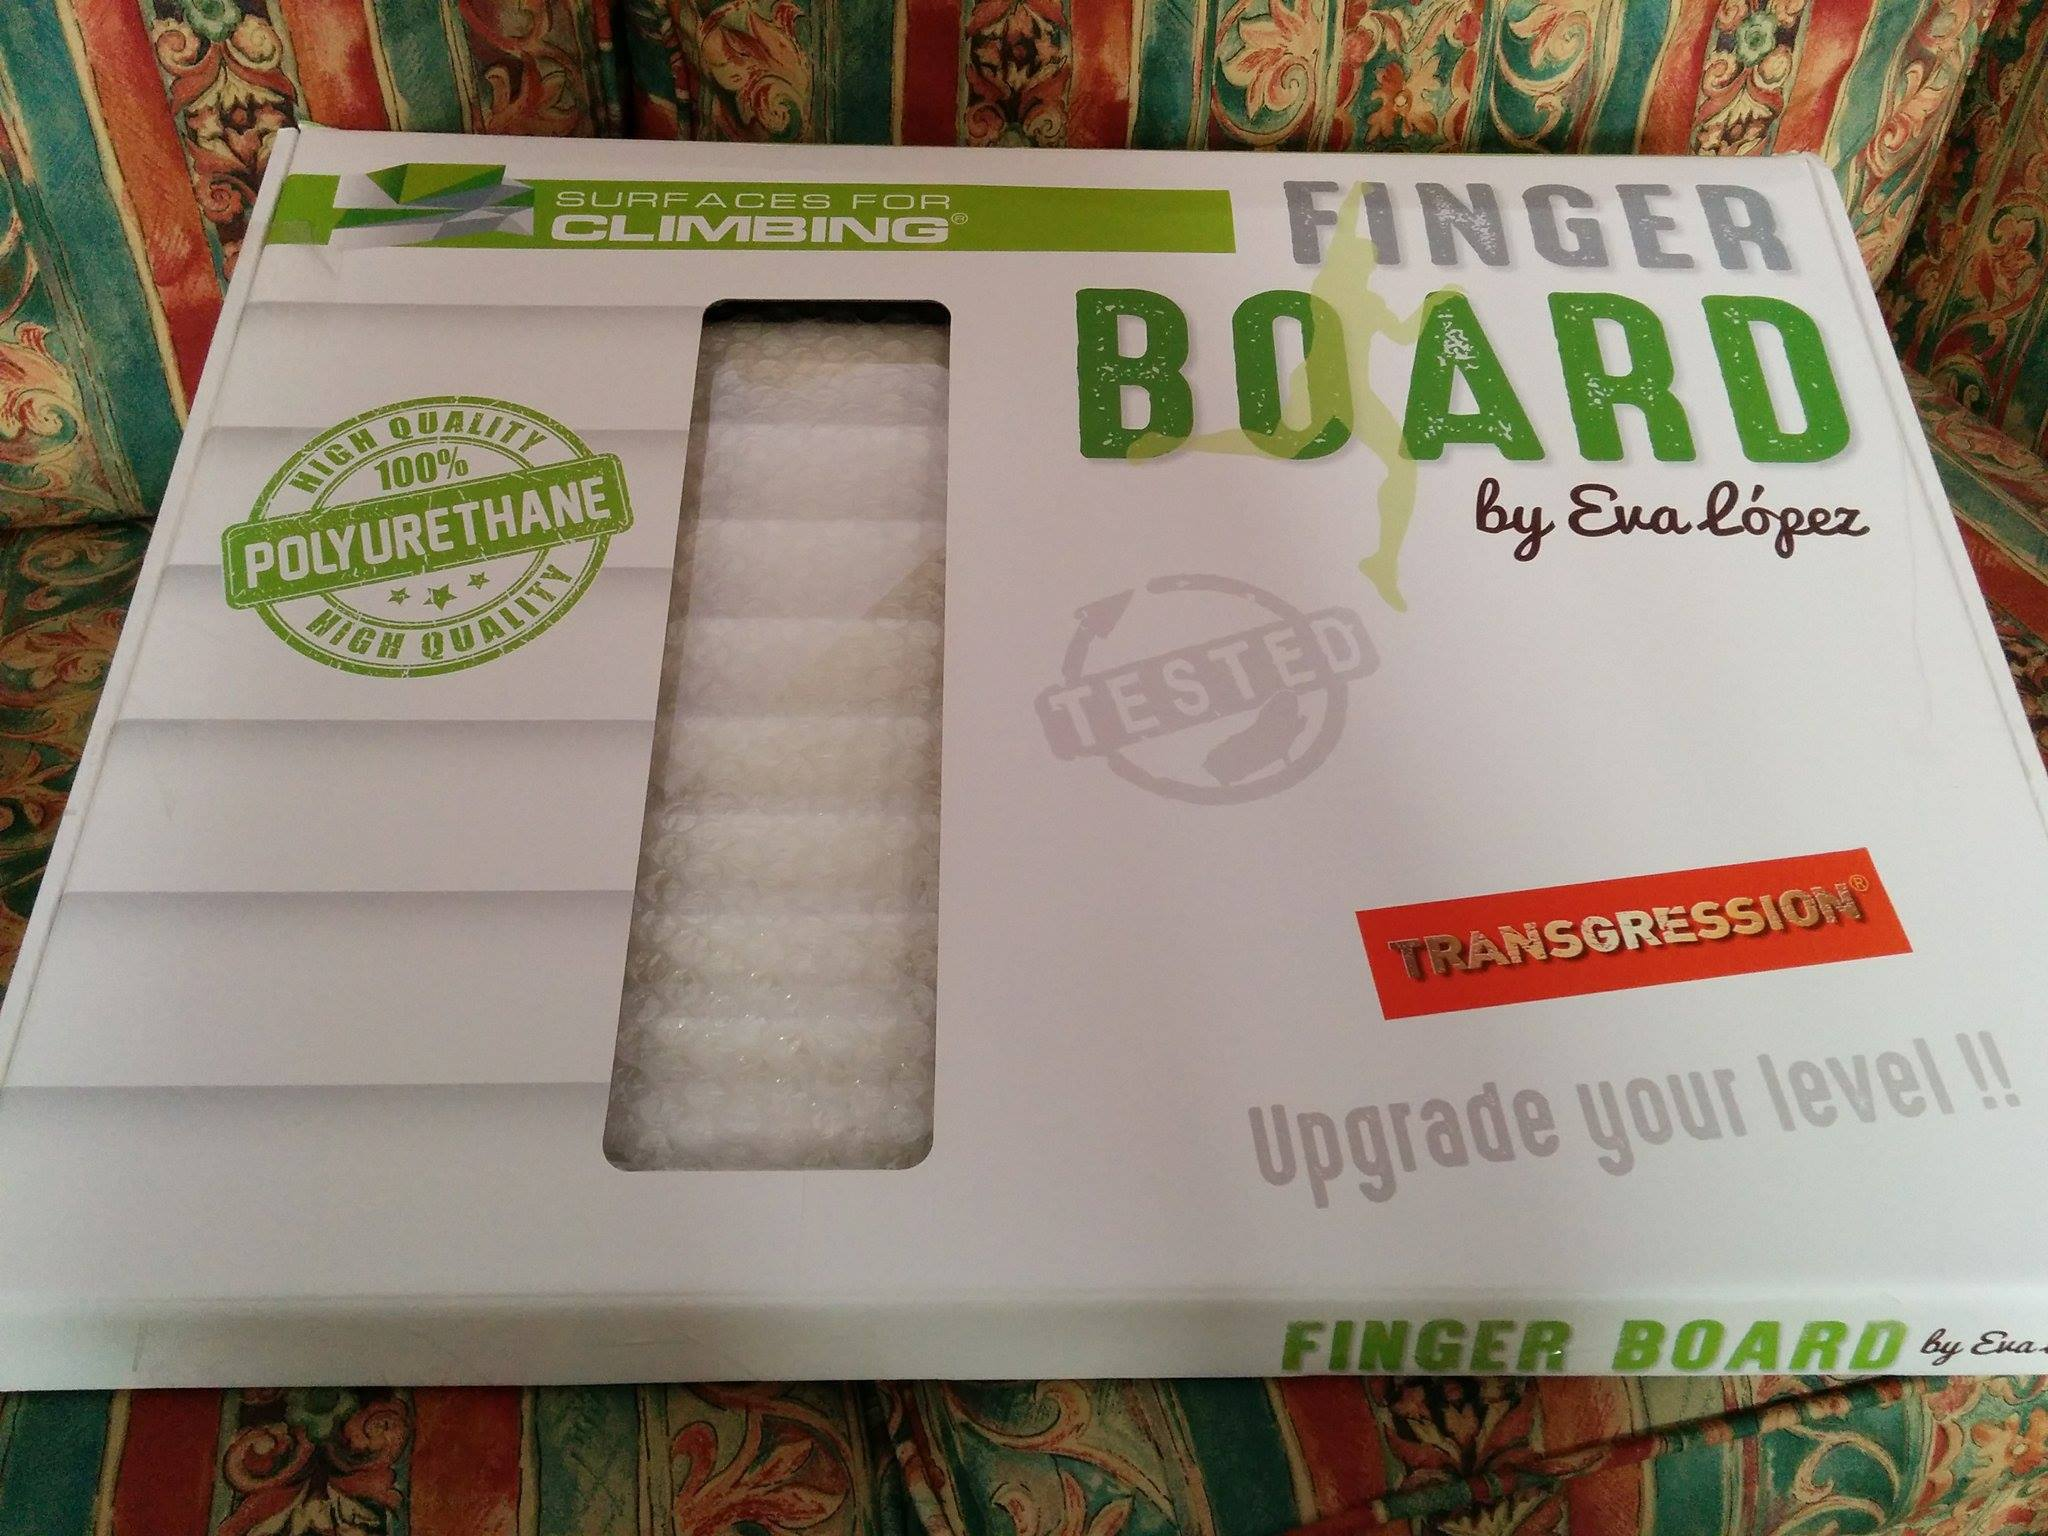 Transgression Finger board by Eva Lopez